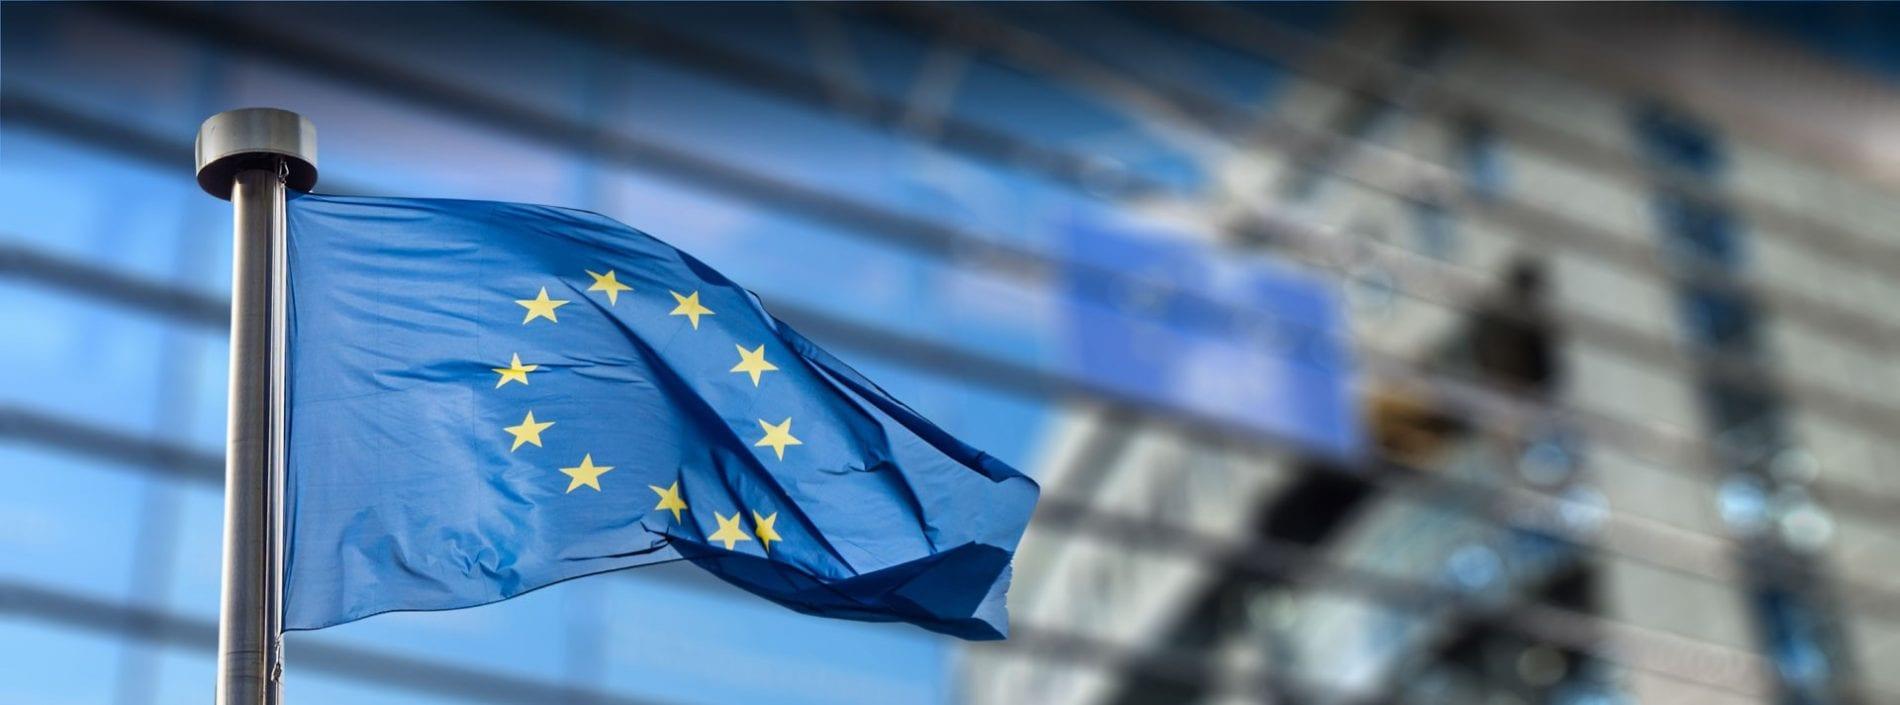 Projkety unijne TLC